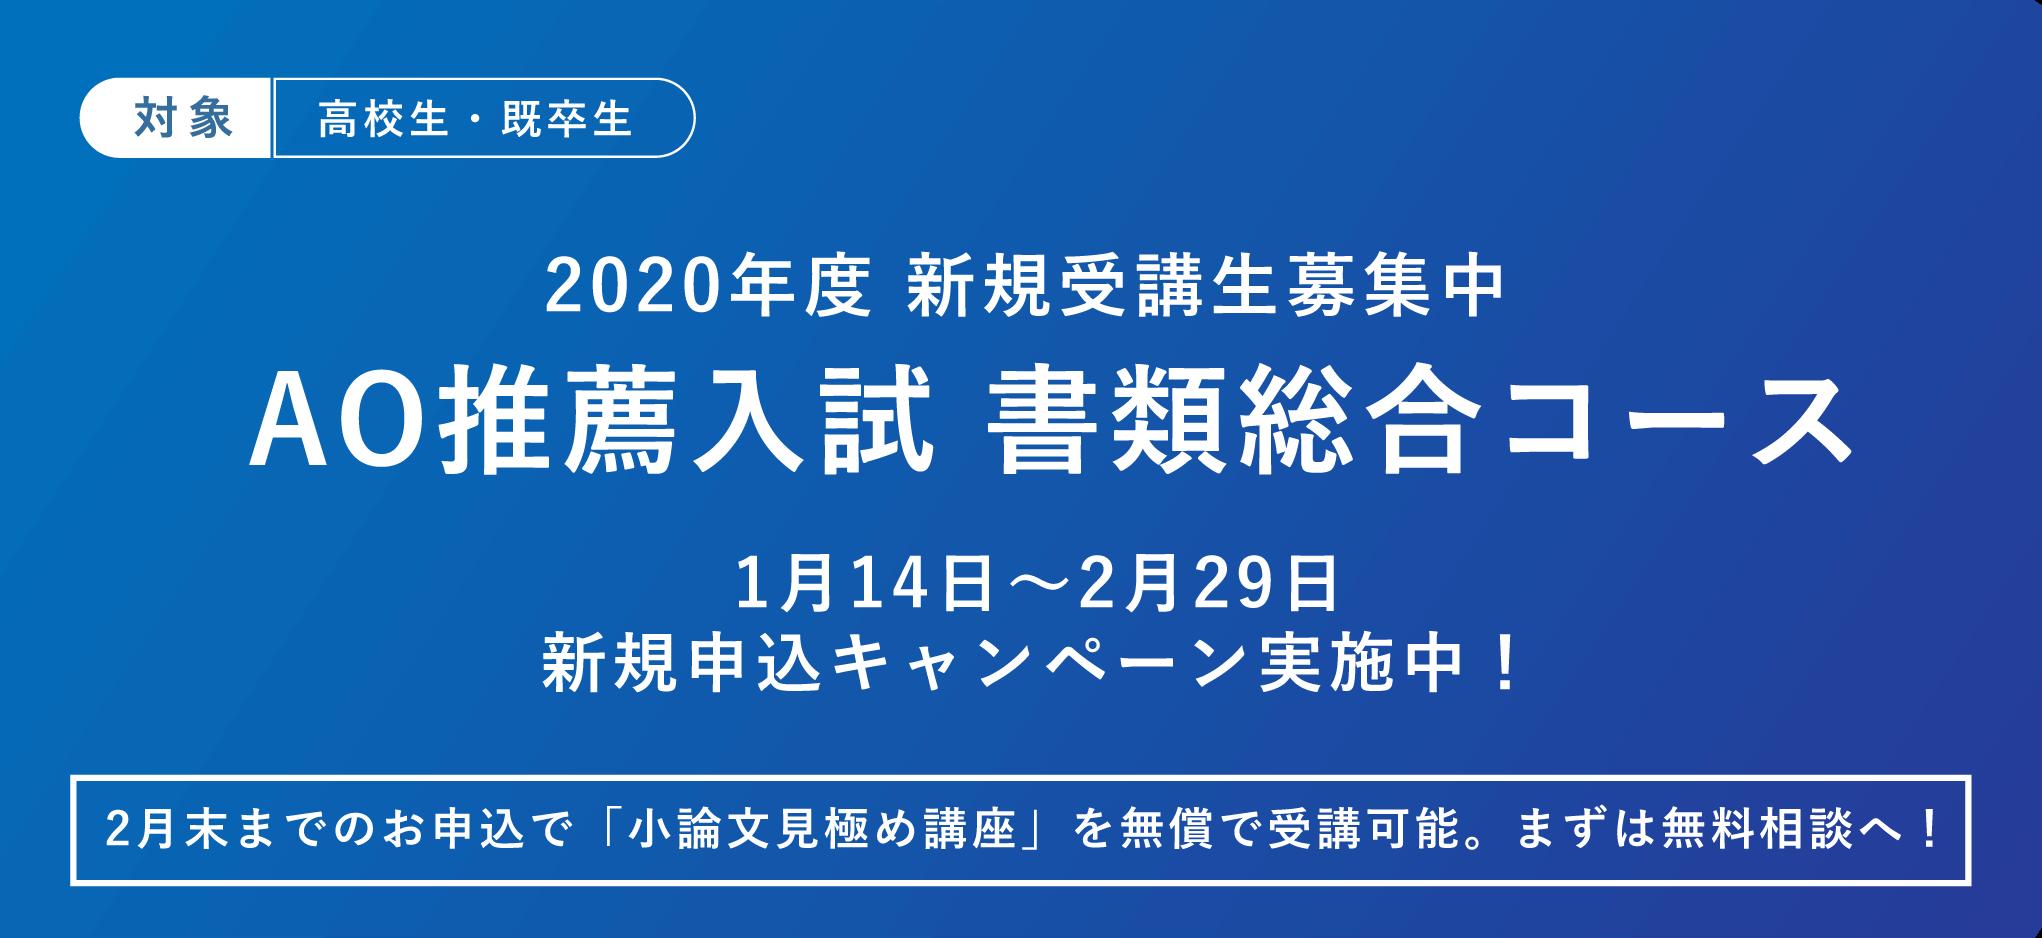 AO推薦入試書類総合コース